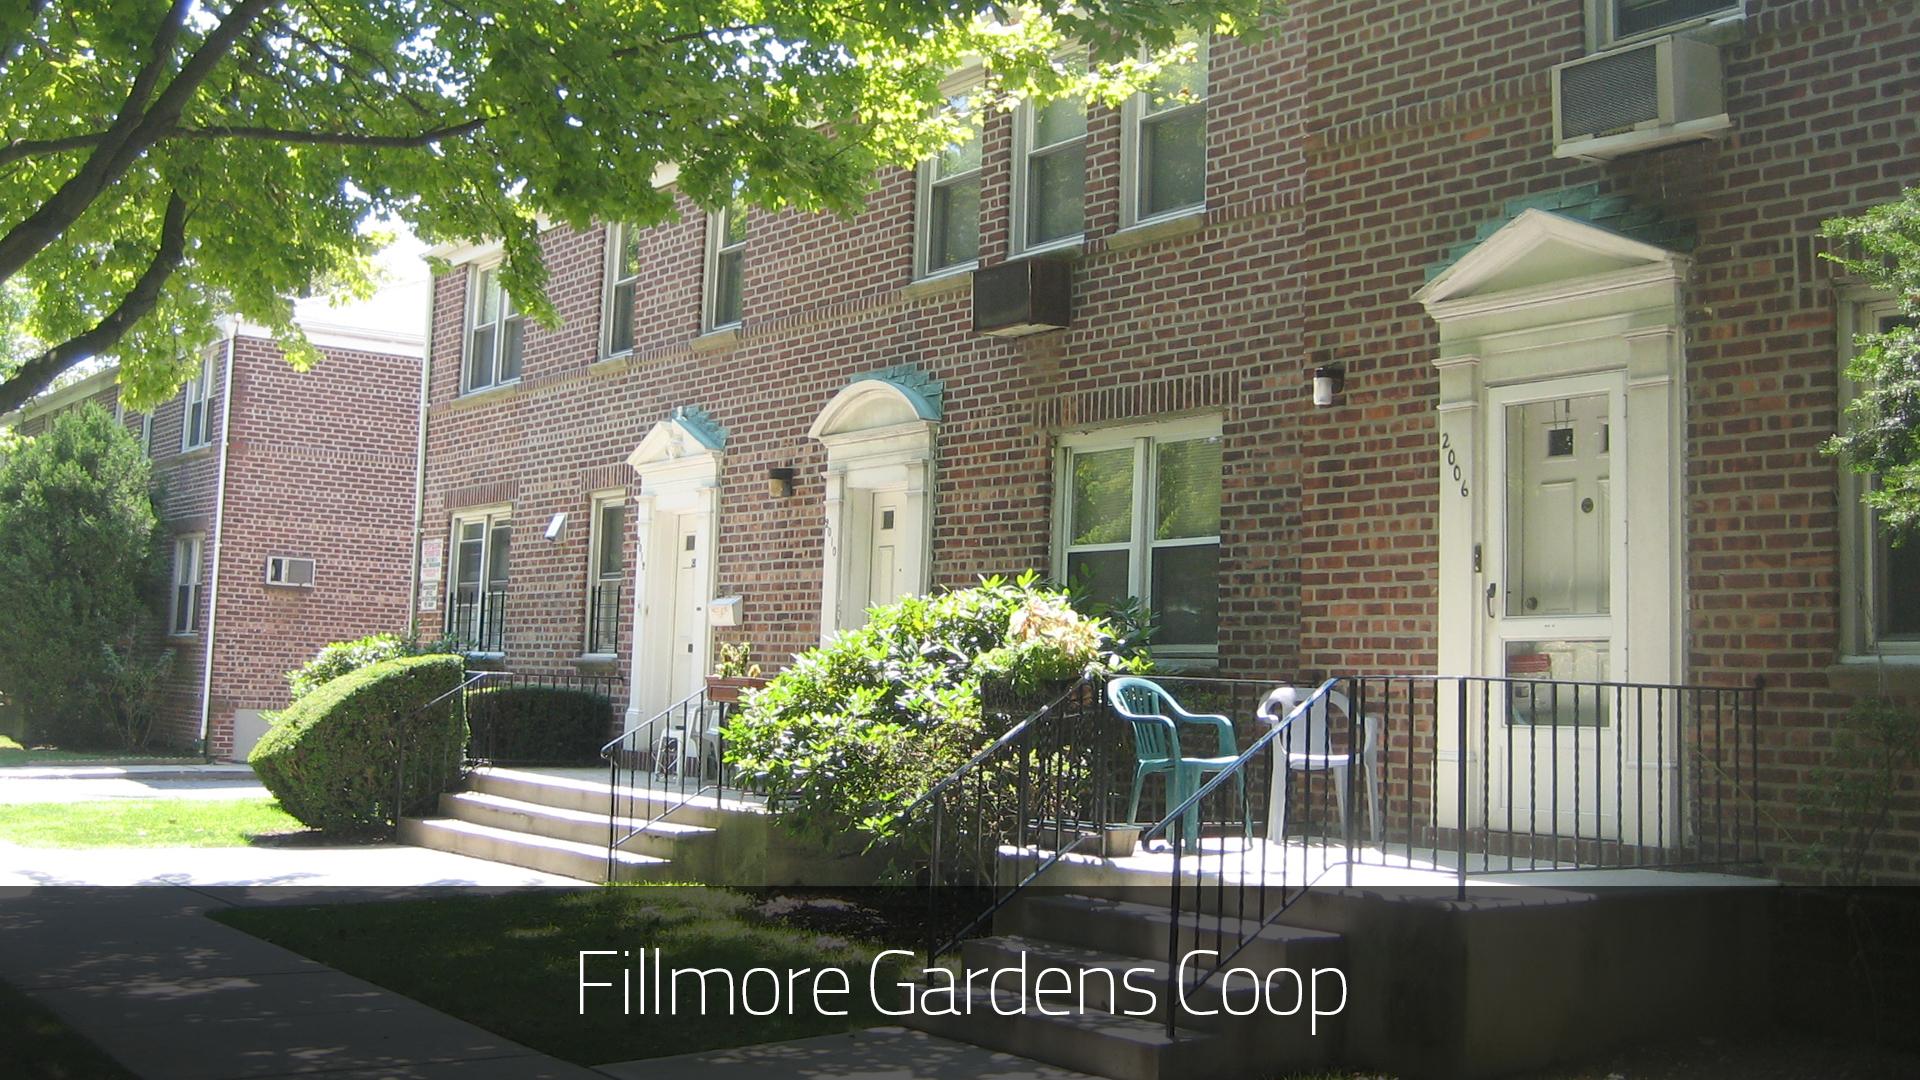 Fillmore gardens coop